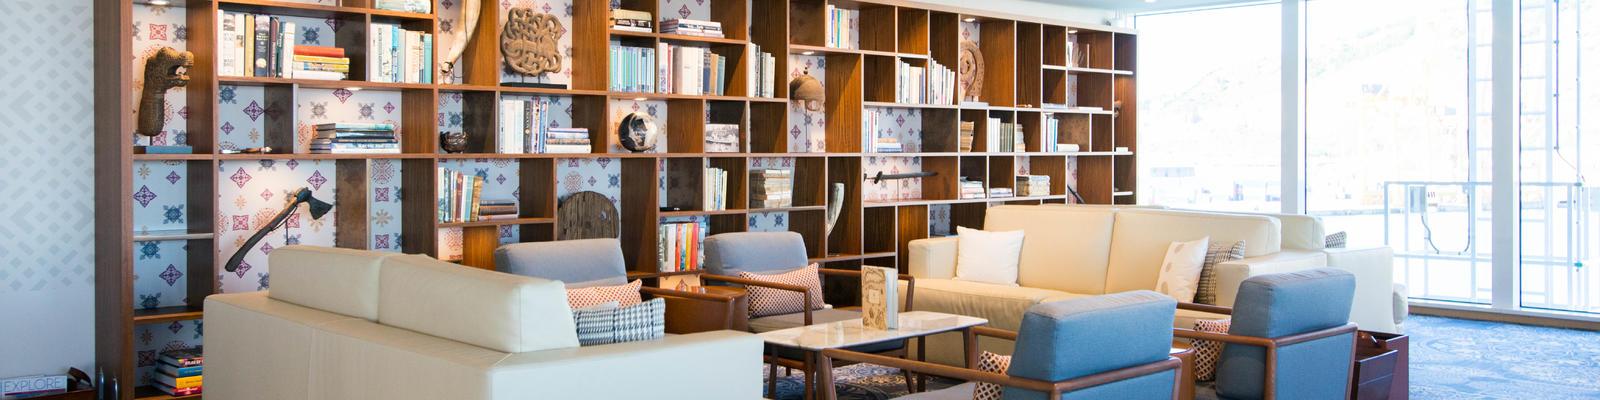 Explorers' Lounge on Viking Star (Photo: Cruise Critic)